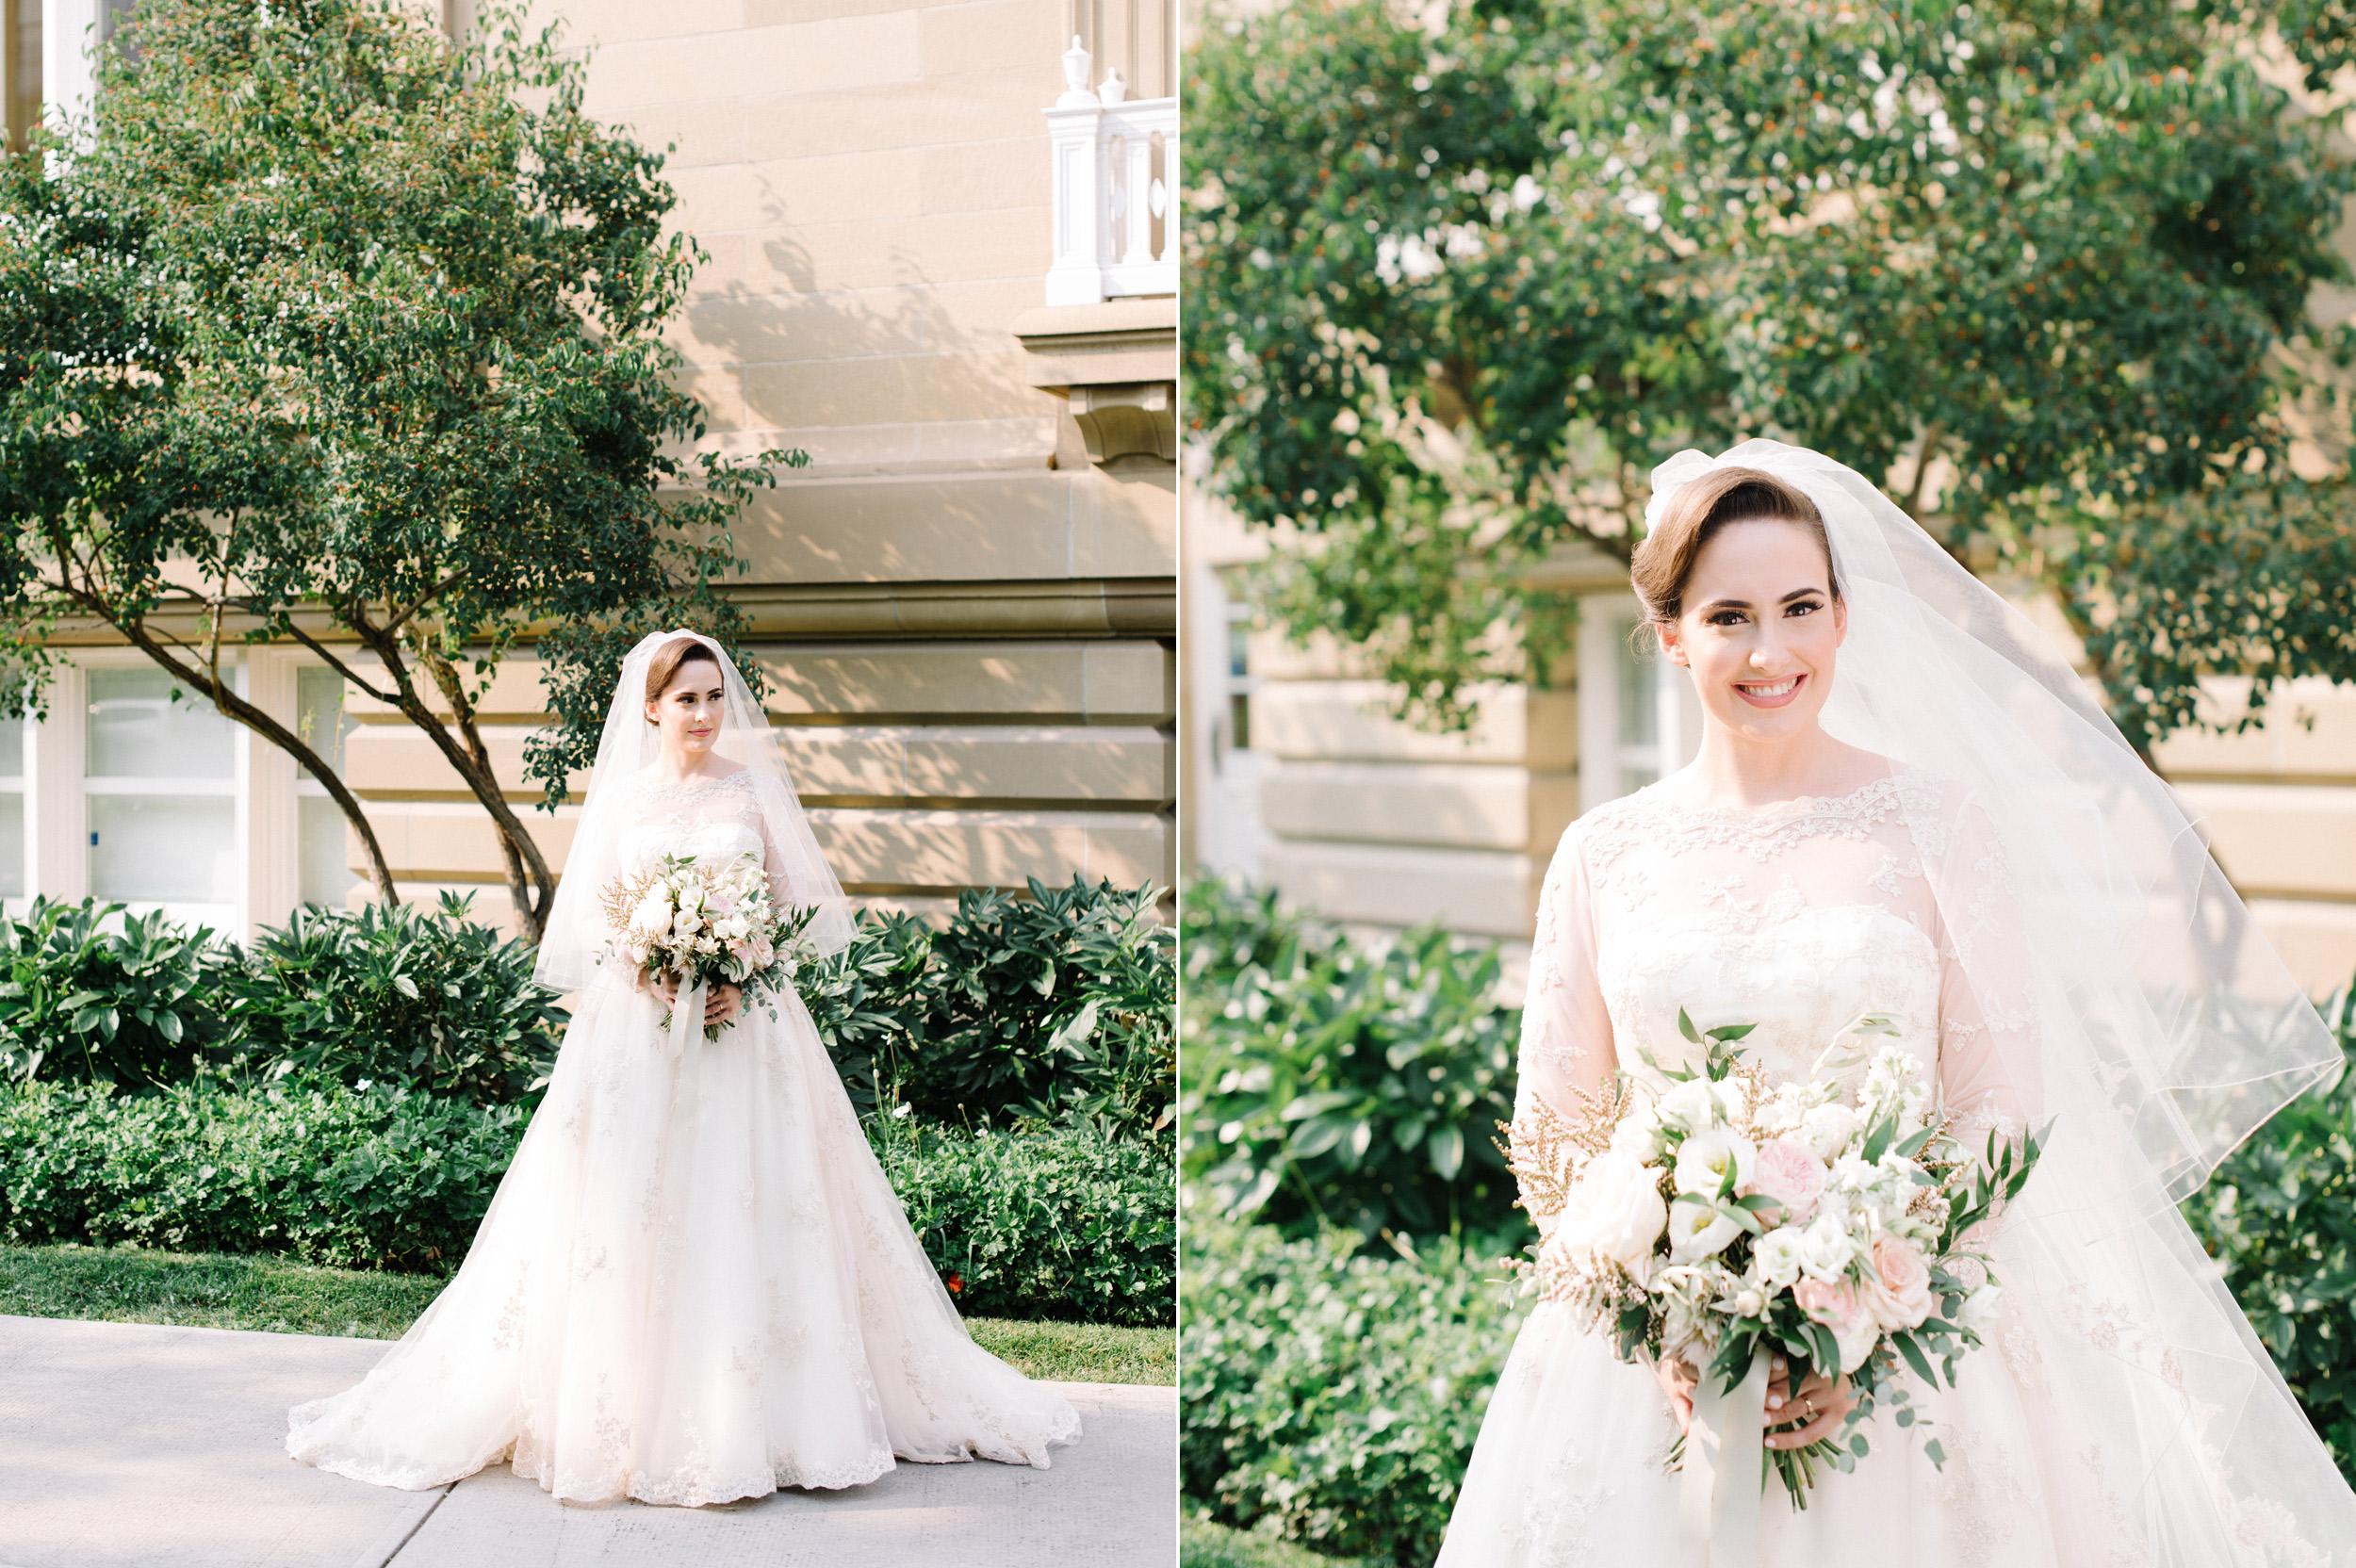 039-calgary_wedding_photographers.jpg